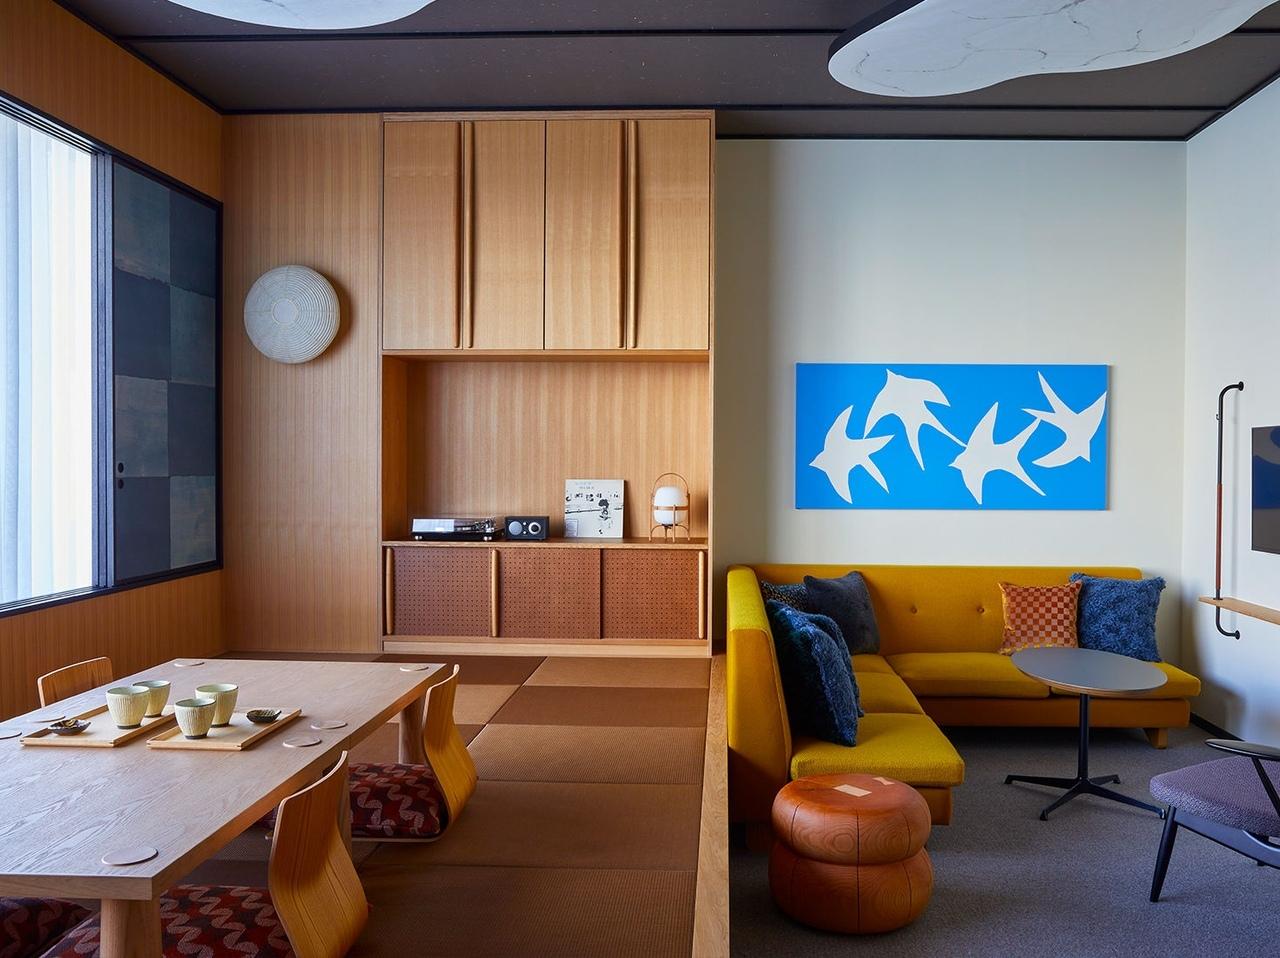 Ace Hotel Kyoto по проекту Кенго Кумы